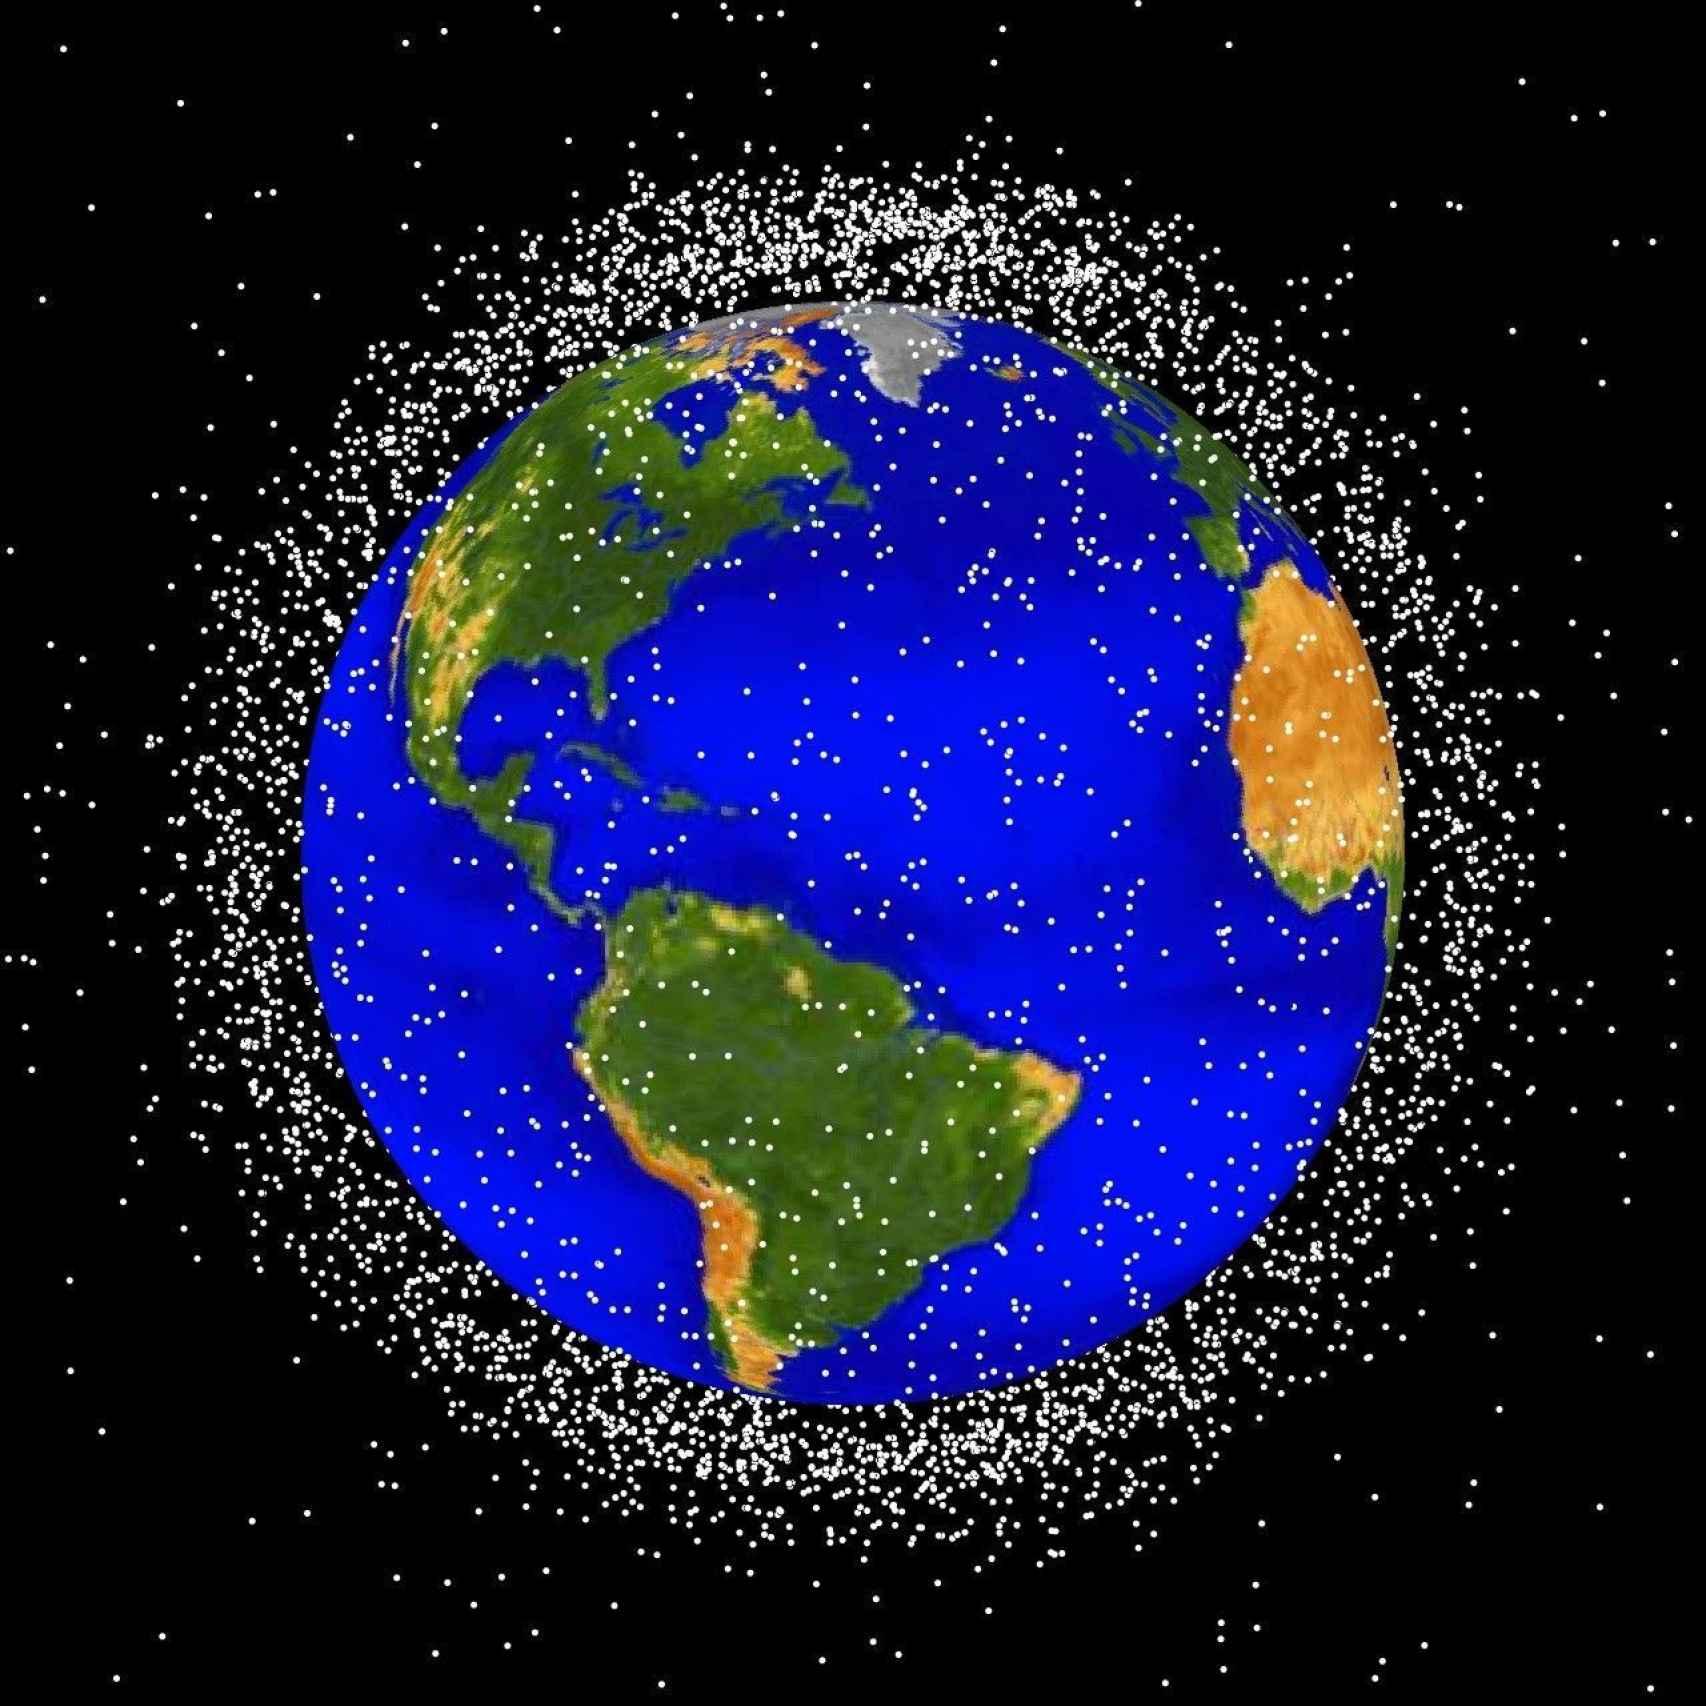 La chatarra espacial en órbita baja terrestre.